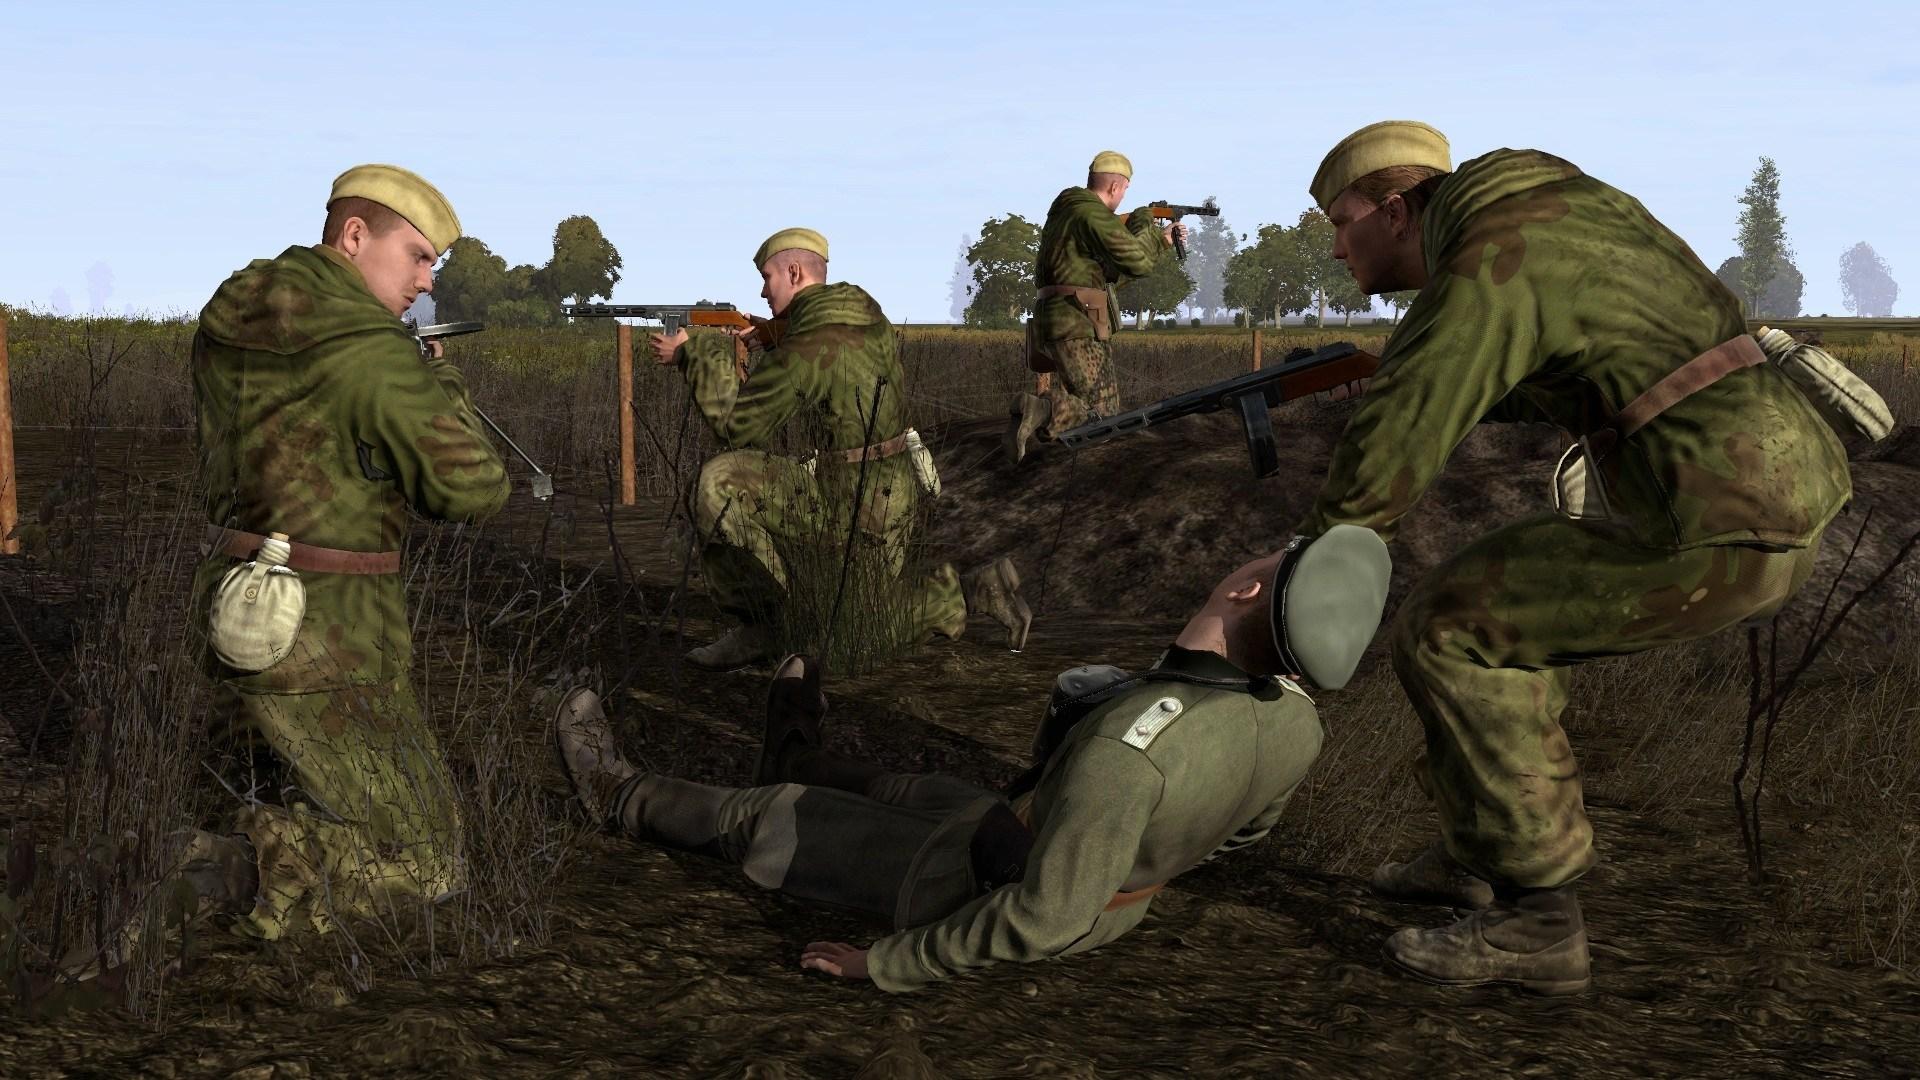 Iron Front - Liberation 1944 gets a new set of screenshots